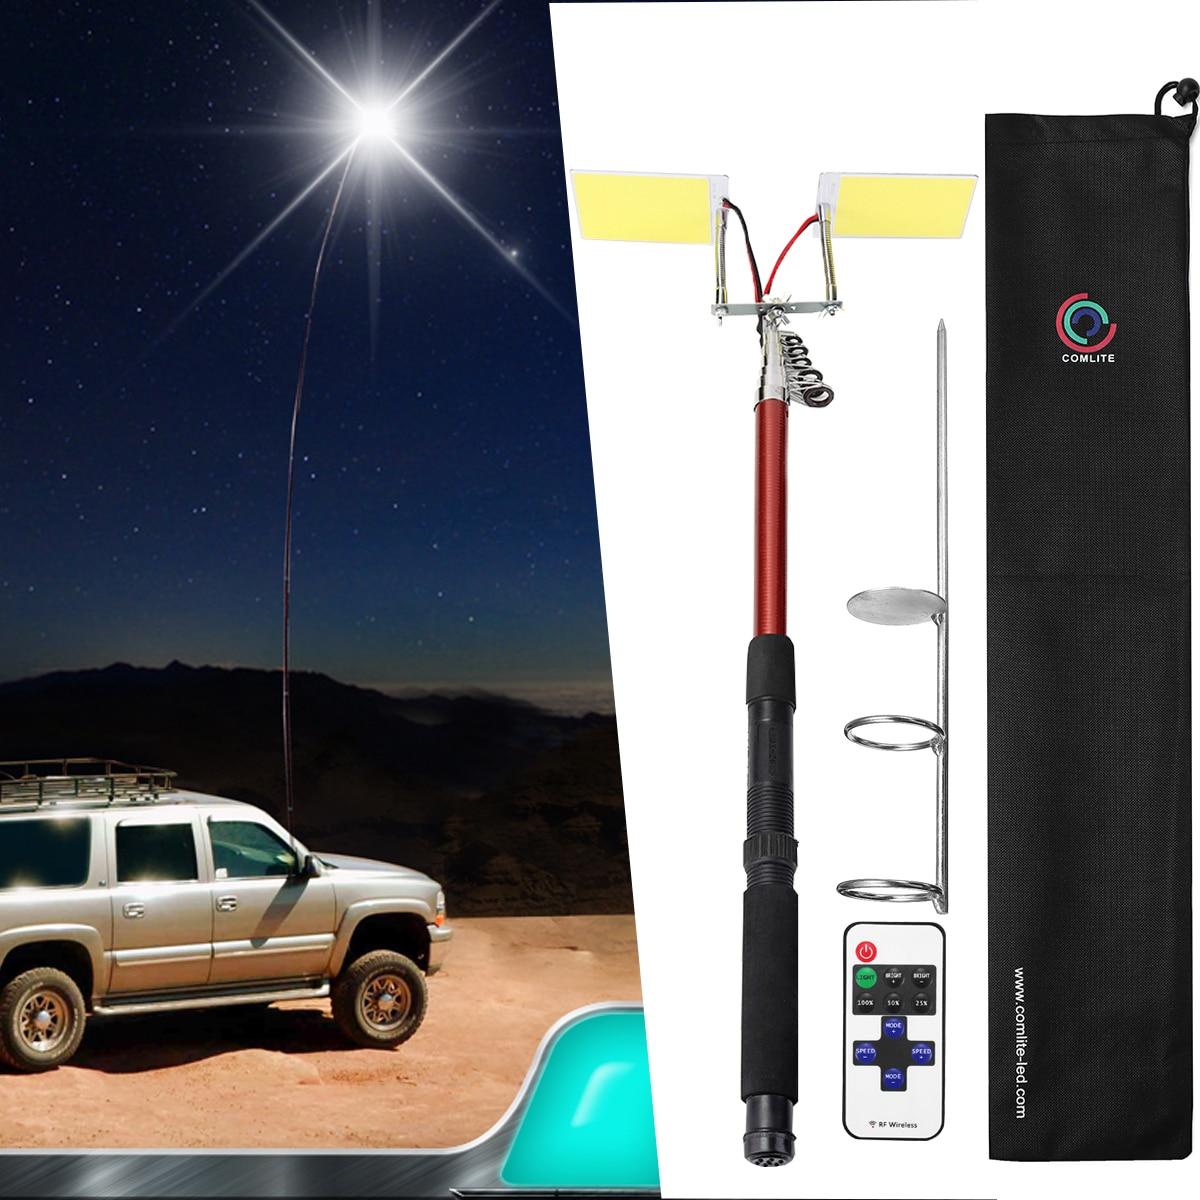 12V LED Outdoor Camping Lantern Telescopic Fishing Rod Light Night Fishing Road Trip Party Lighting